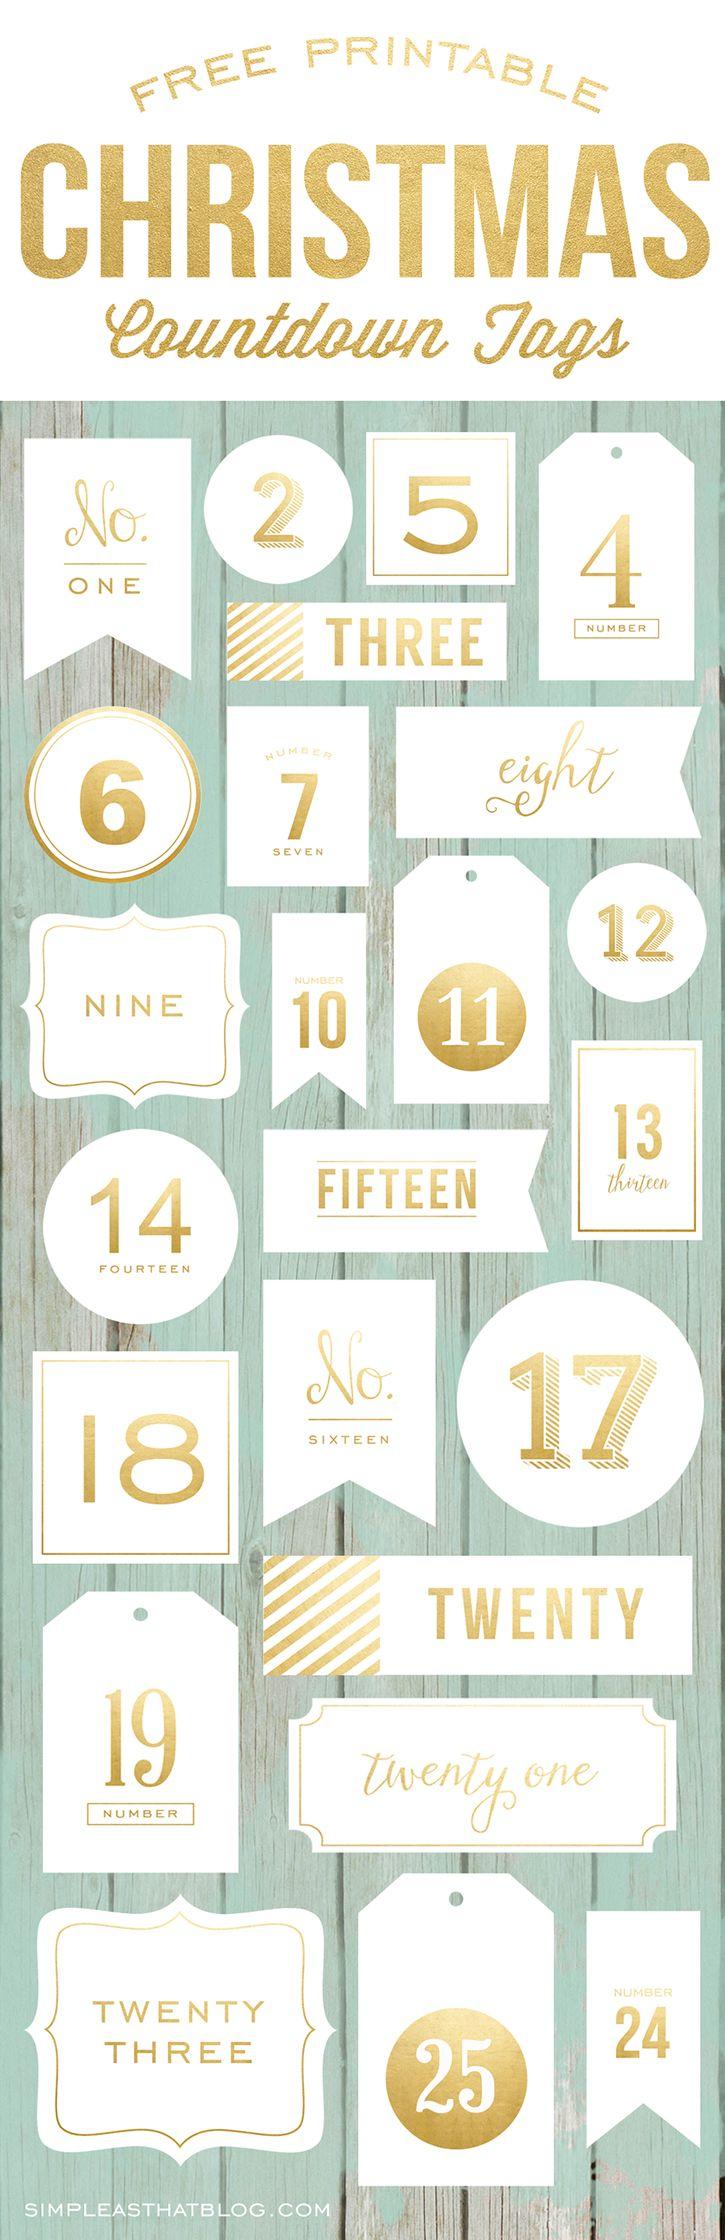 Advent Calendar Printables Free : Advent calendar christmas countdown tags